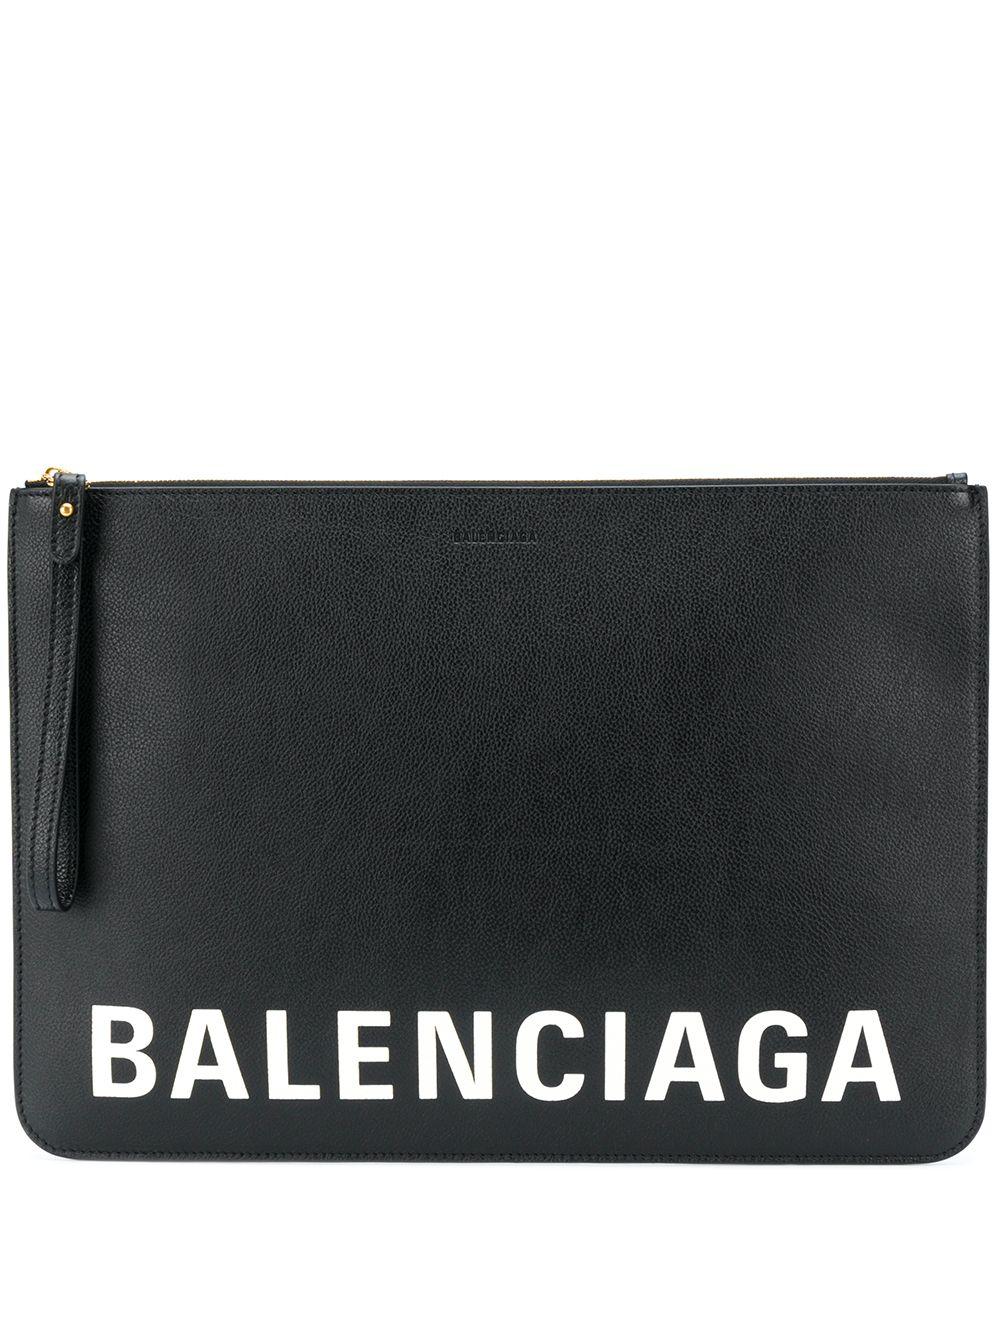 Black calfskin leather  Balenciaga logo-print clutch bag BALENCIAGA      630626-1IZKM1090